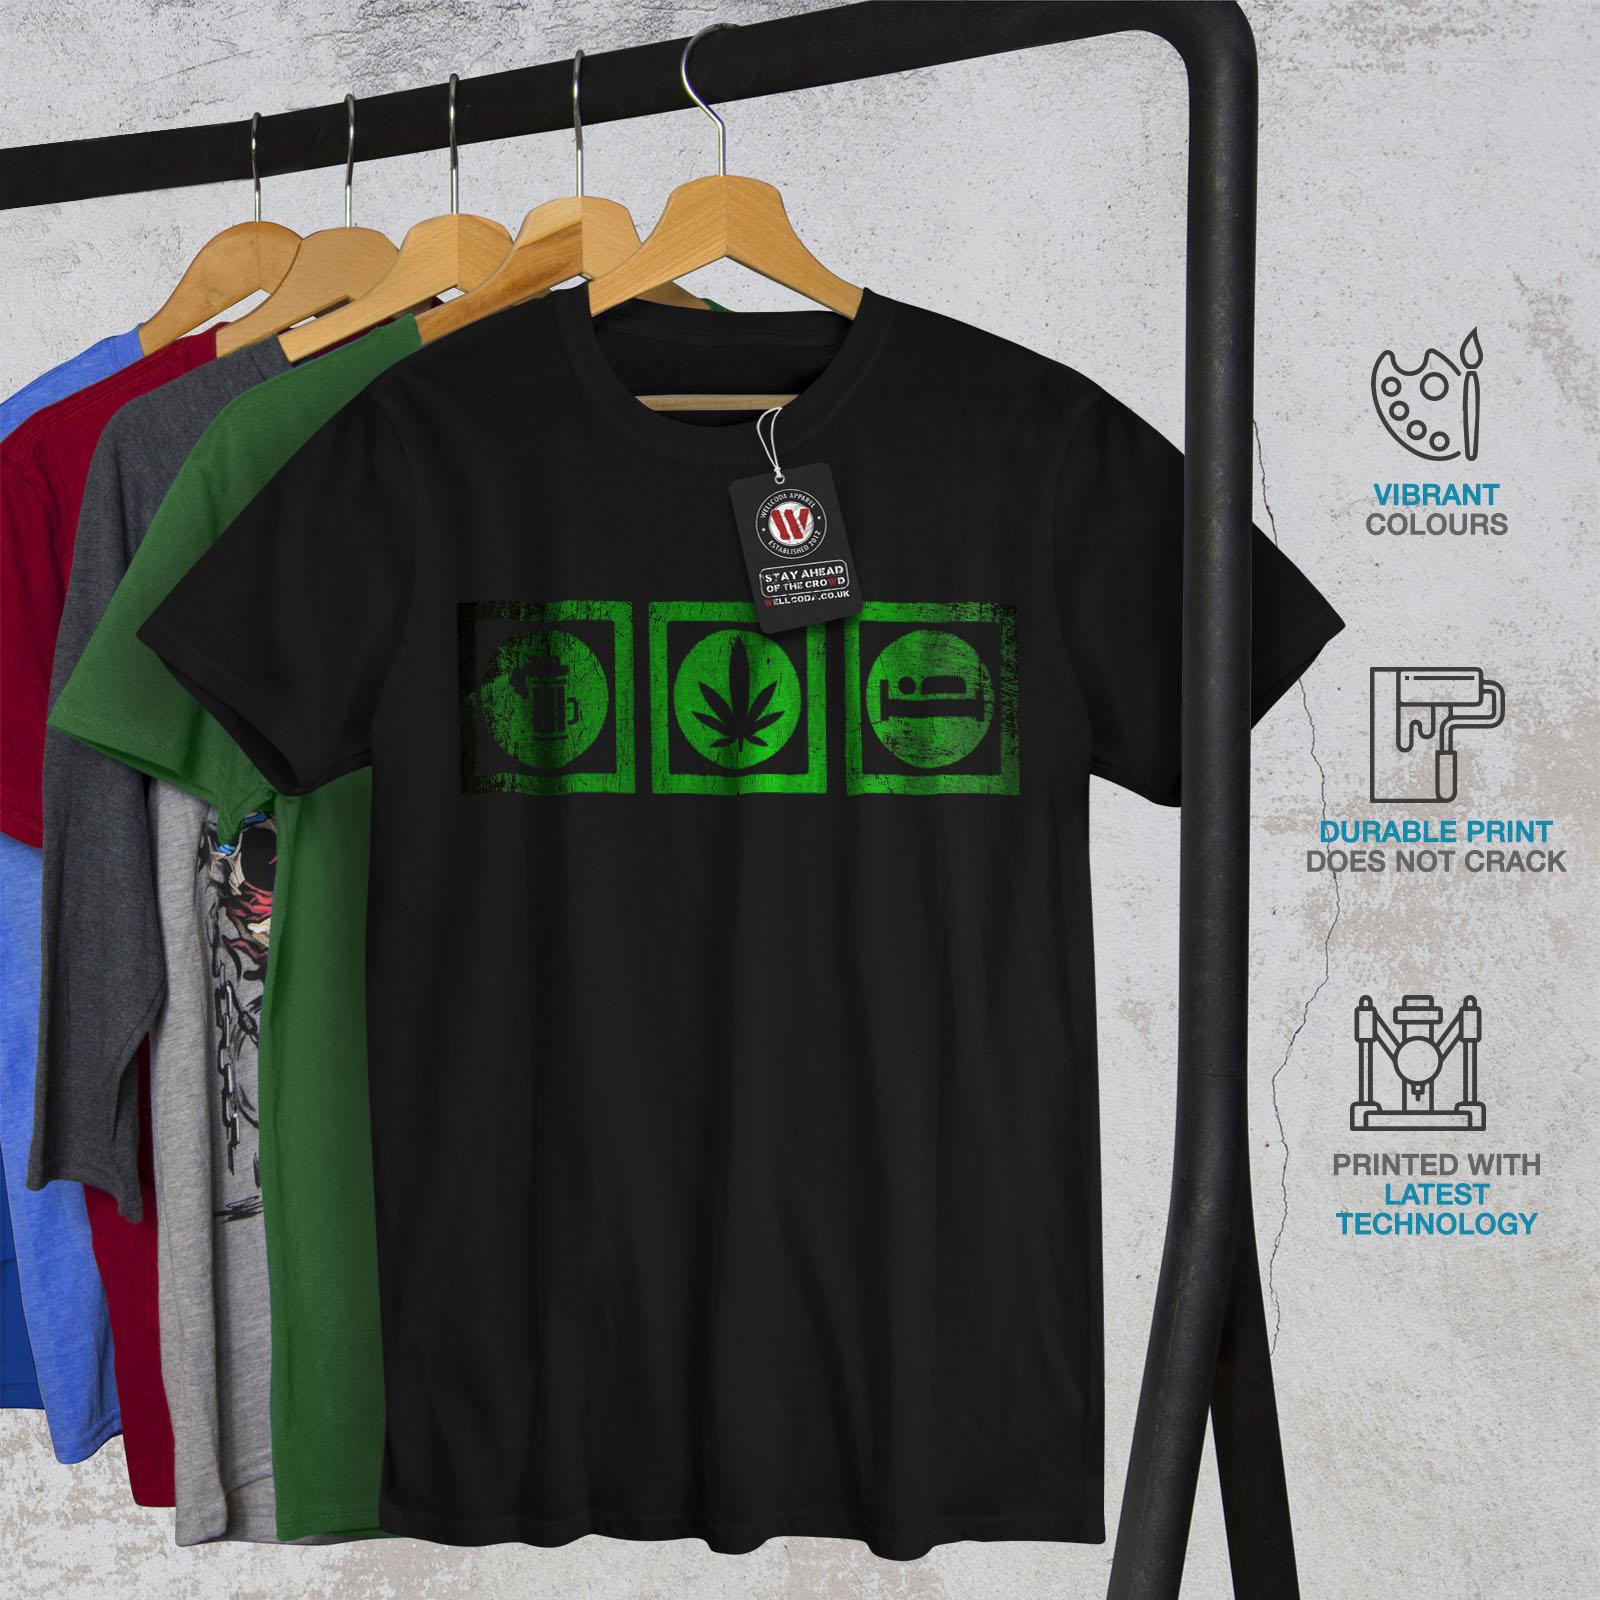 Wellcoda BIRRA ERBA SLEEP Divertente Uomo T-shirt Life design grafico stampato T-shirt